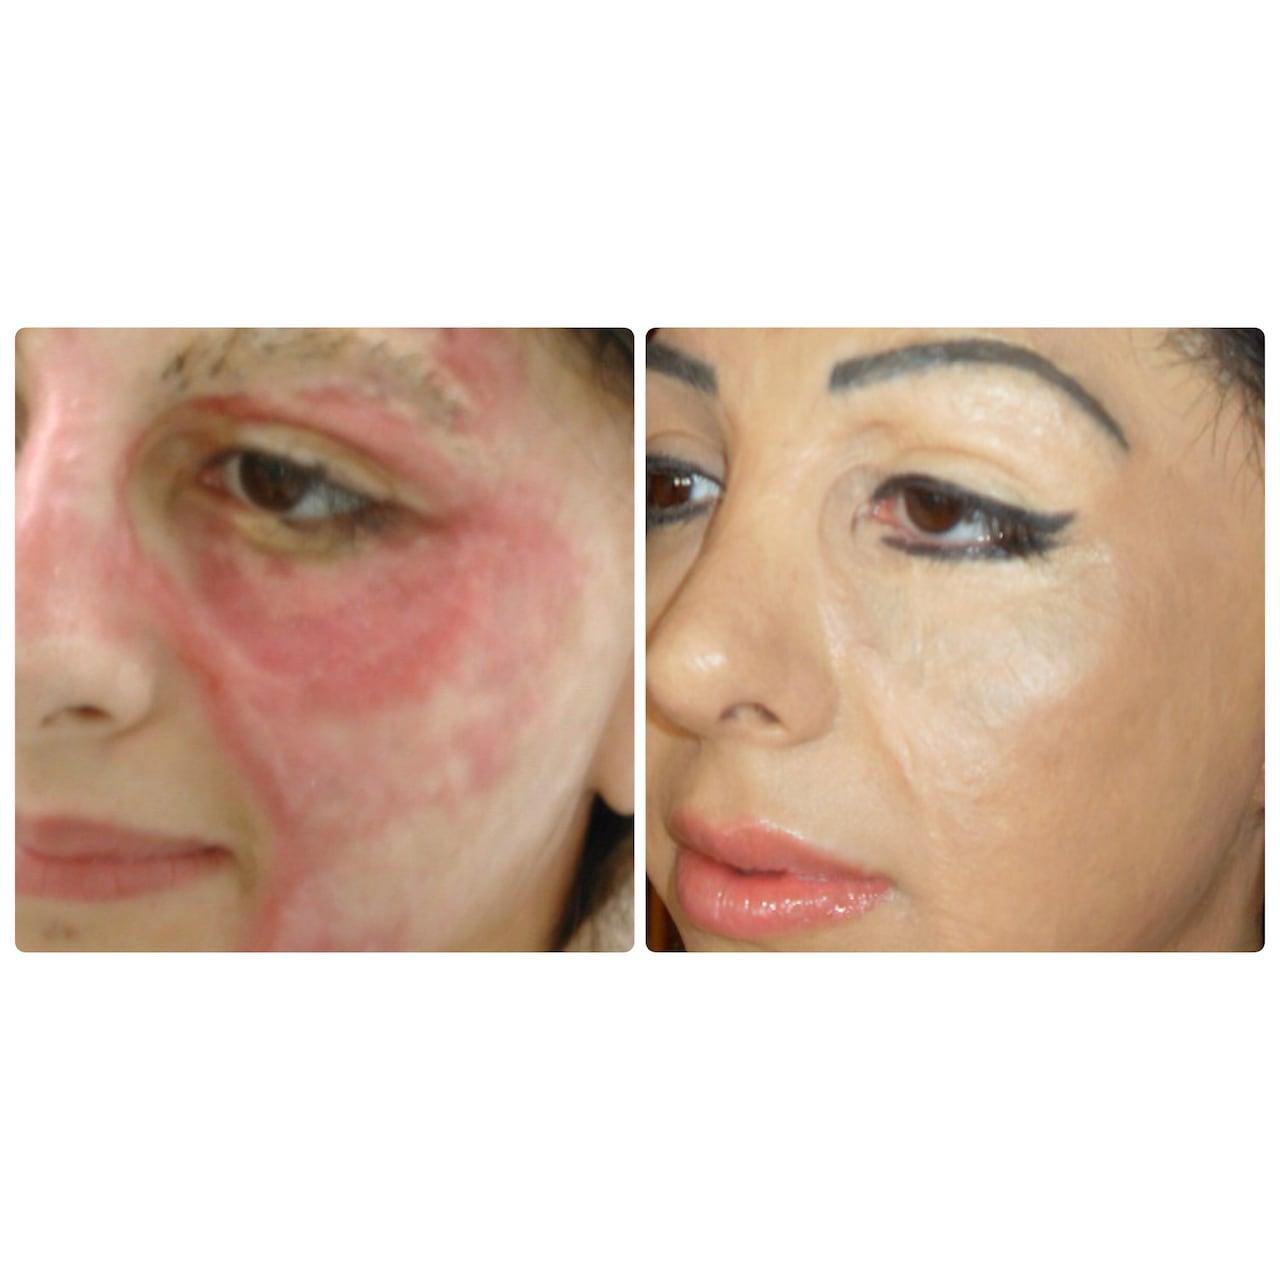 2f240cbf0 Basma Hameed creates booming business tattooing scars | CBC News